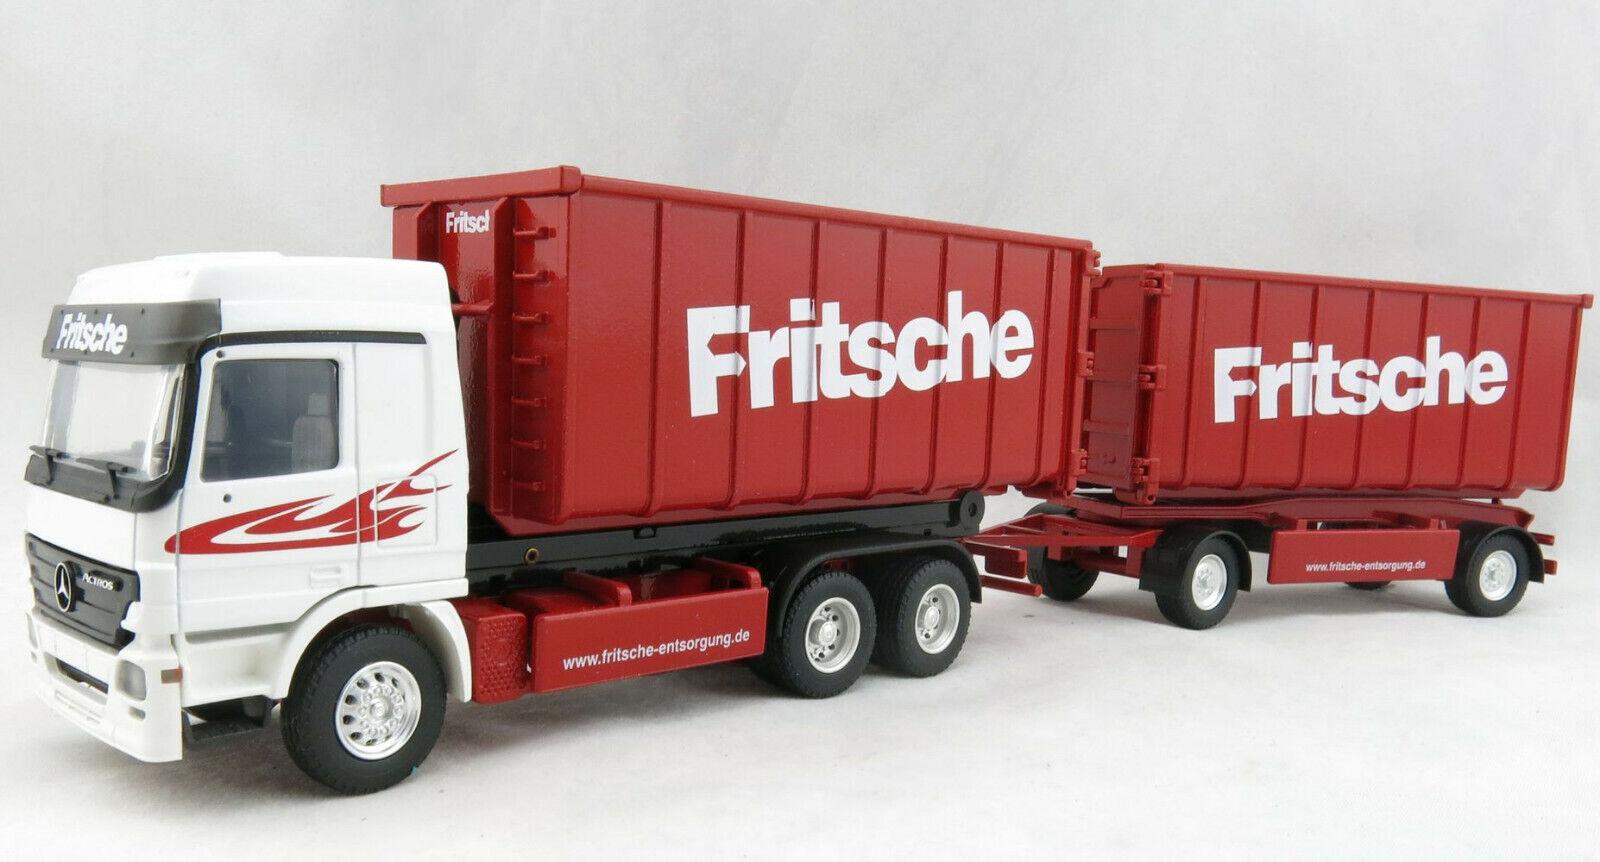 Conrad 40156 0 Mercedes Actros 3-axle ReRadfahren Roll-Off Container FRITSCHE 1 50